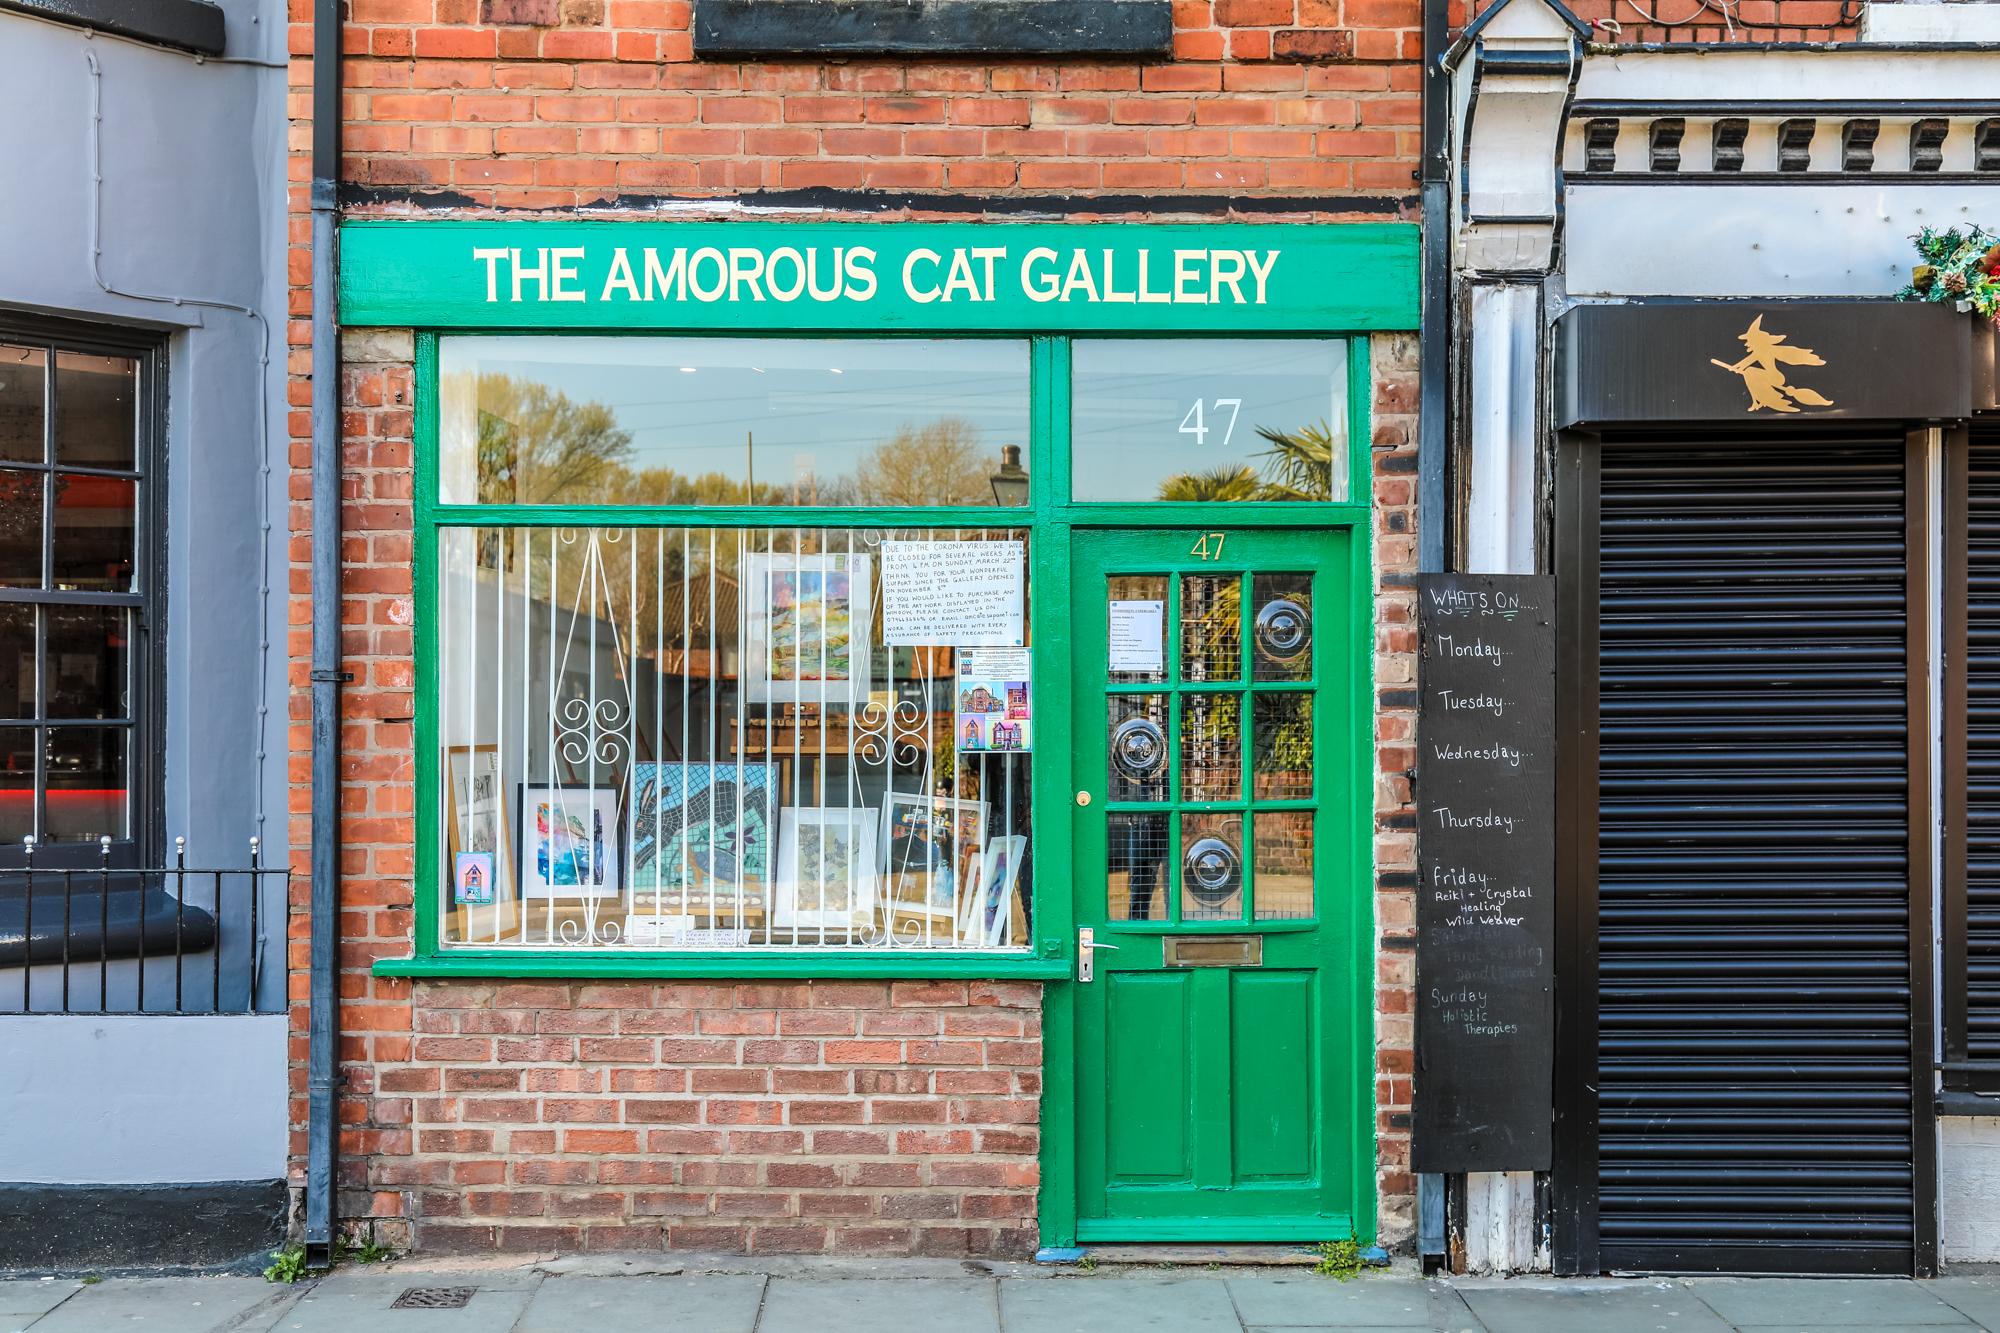 Amorous Cat Gallery